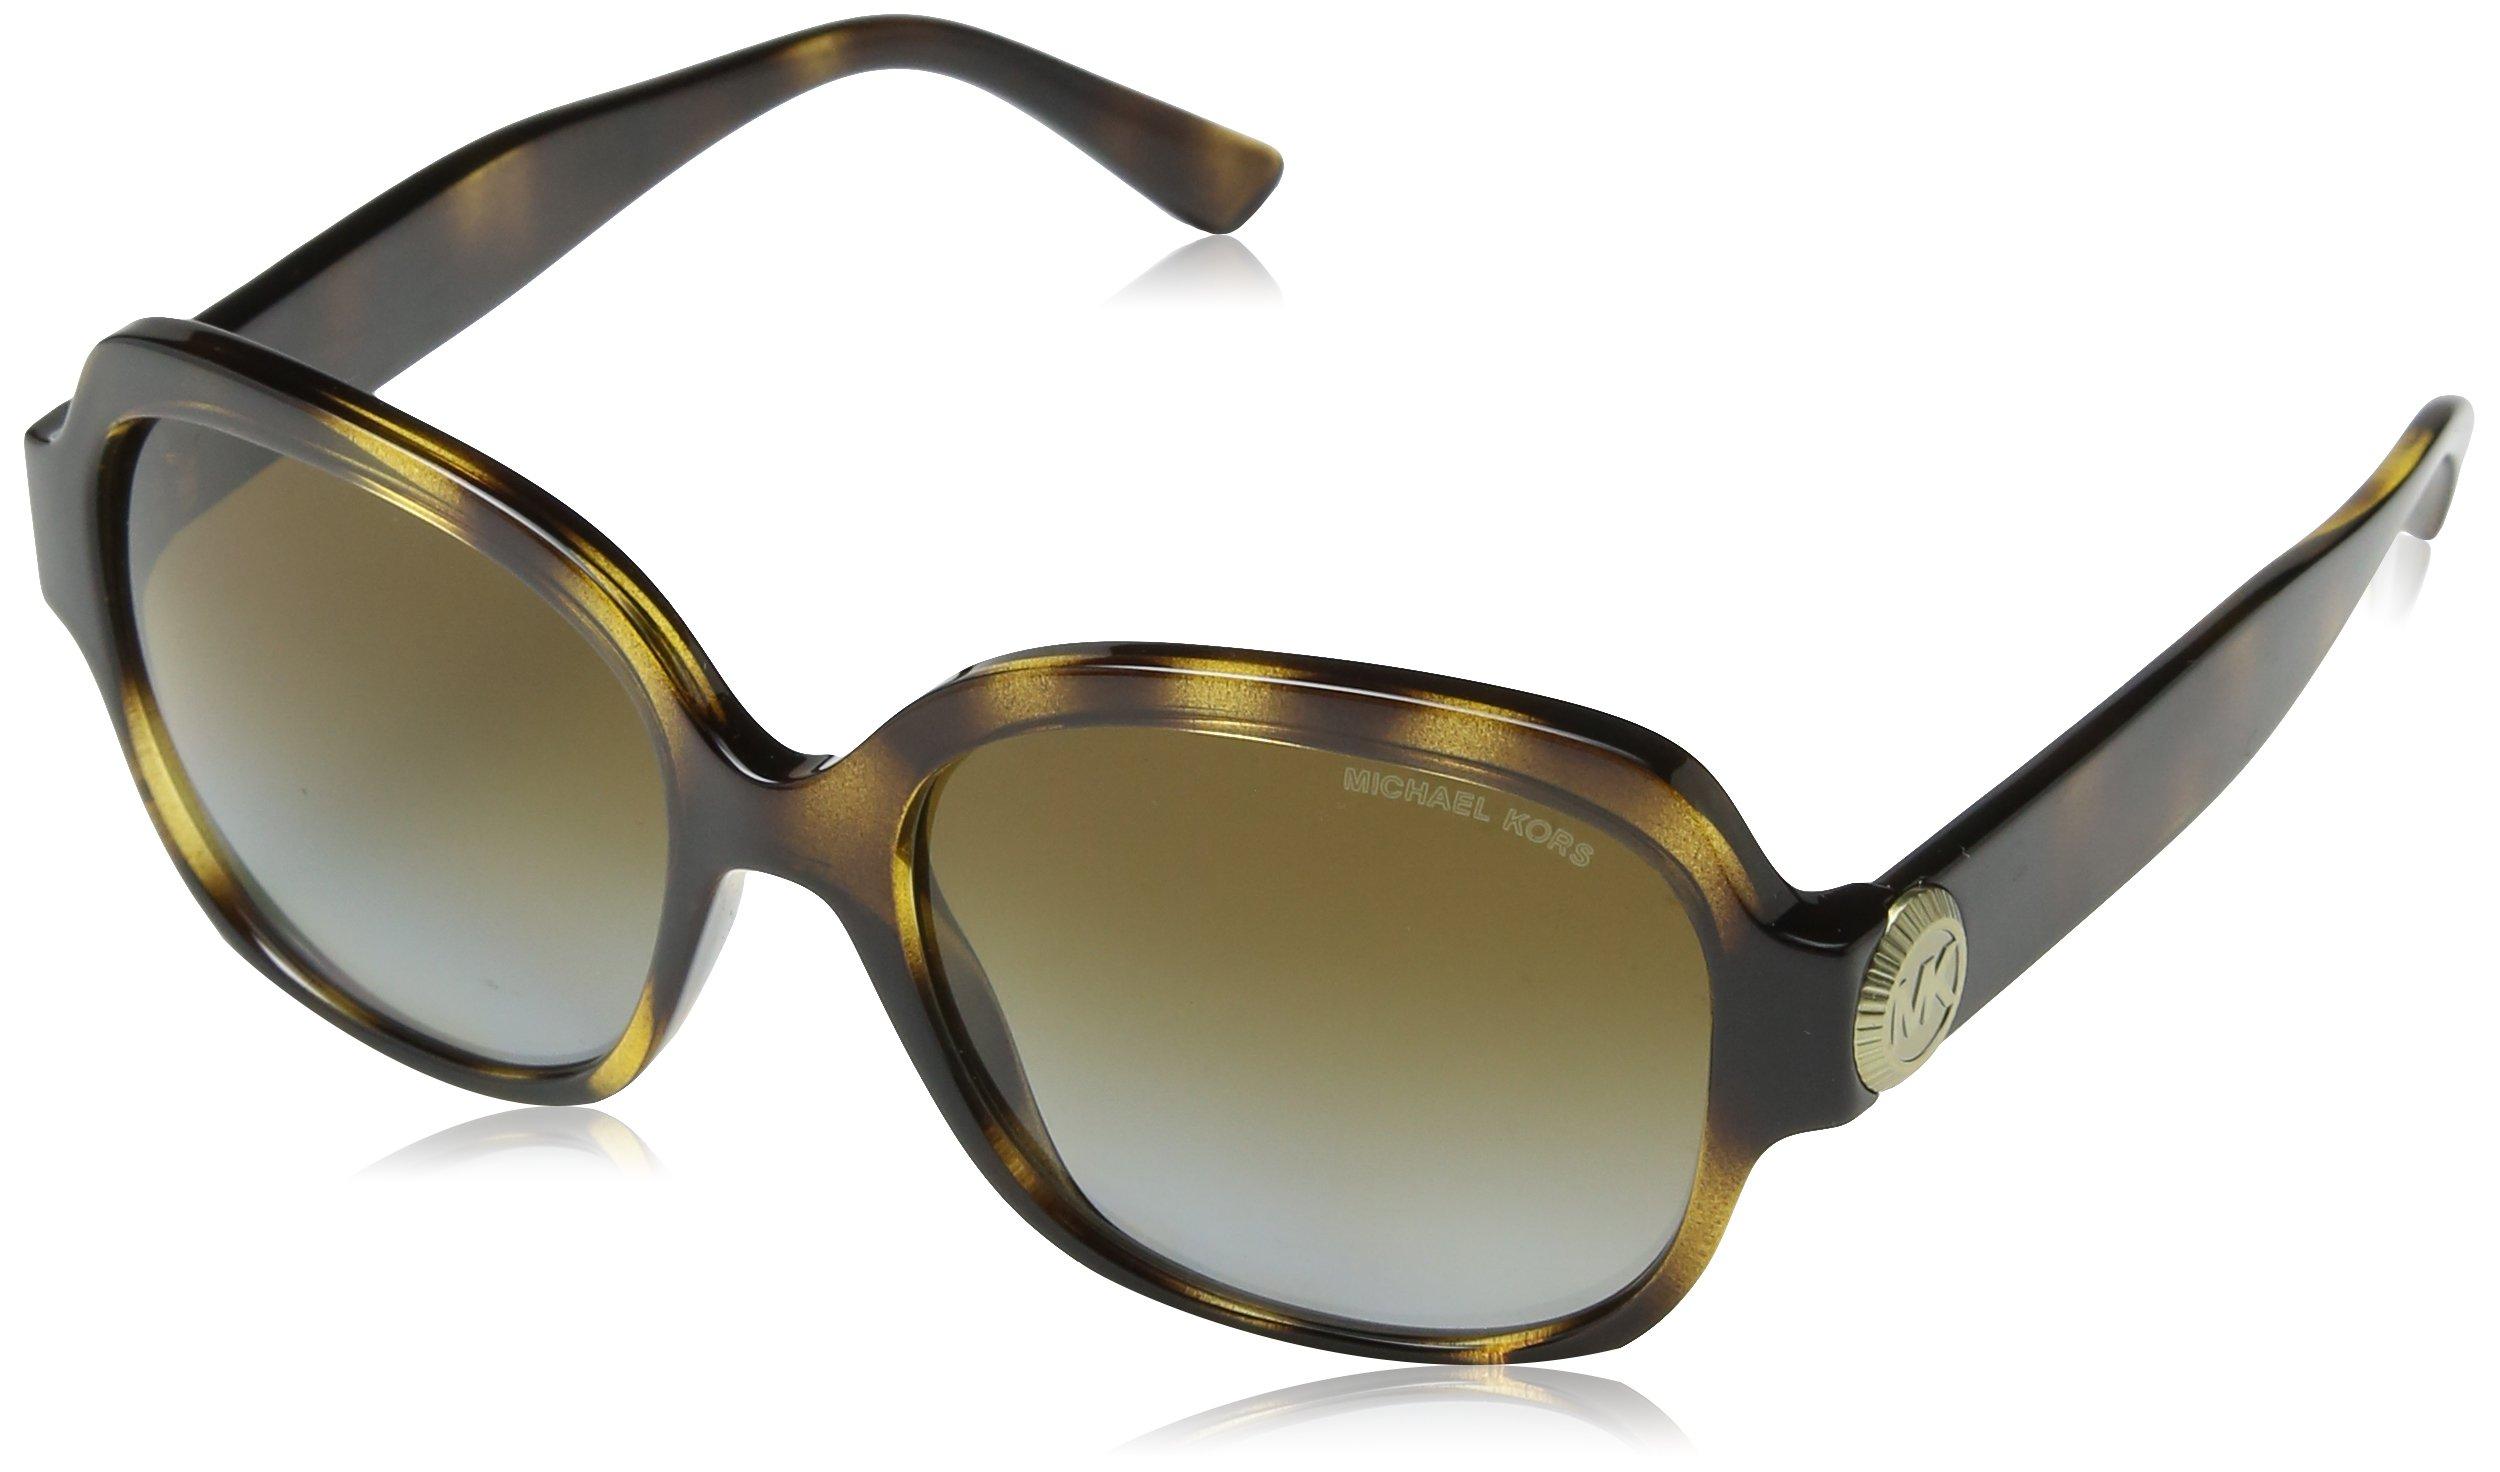 Michael Kors Men,Women MK2055 56 SUZ Tortoise/Brown Sunglasses 56mm by Michael Kors